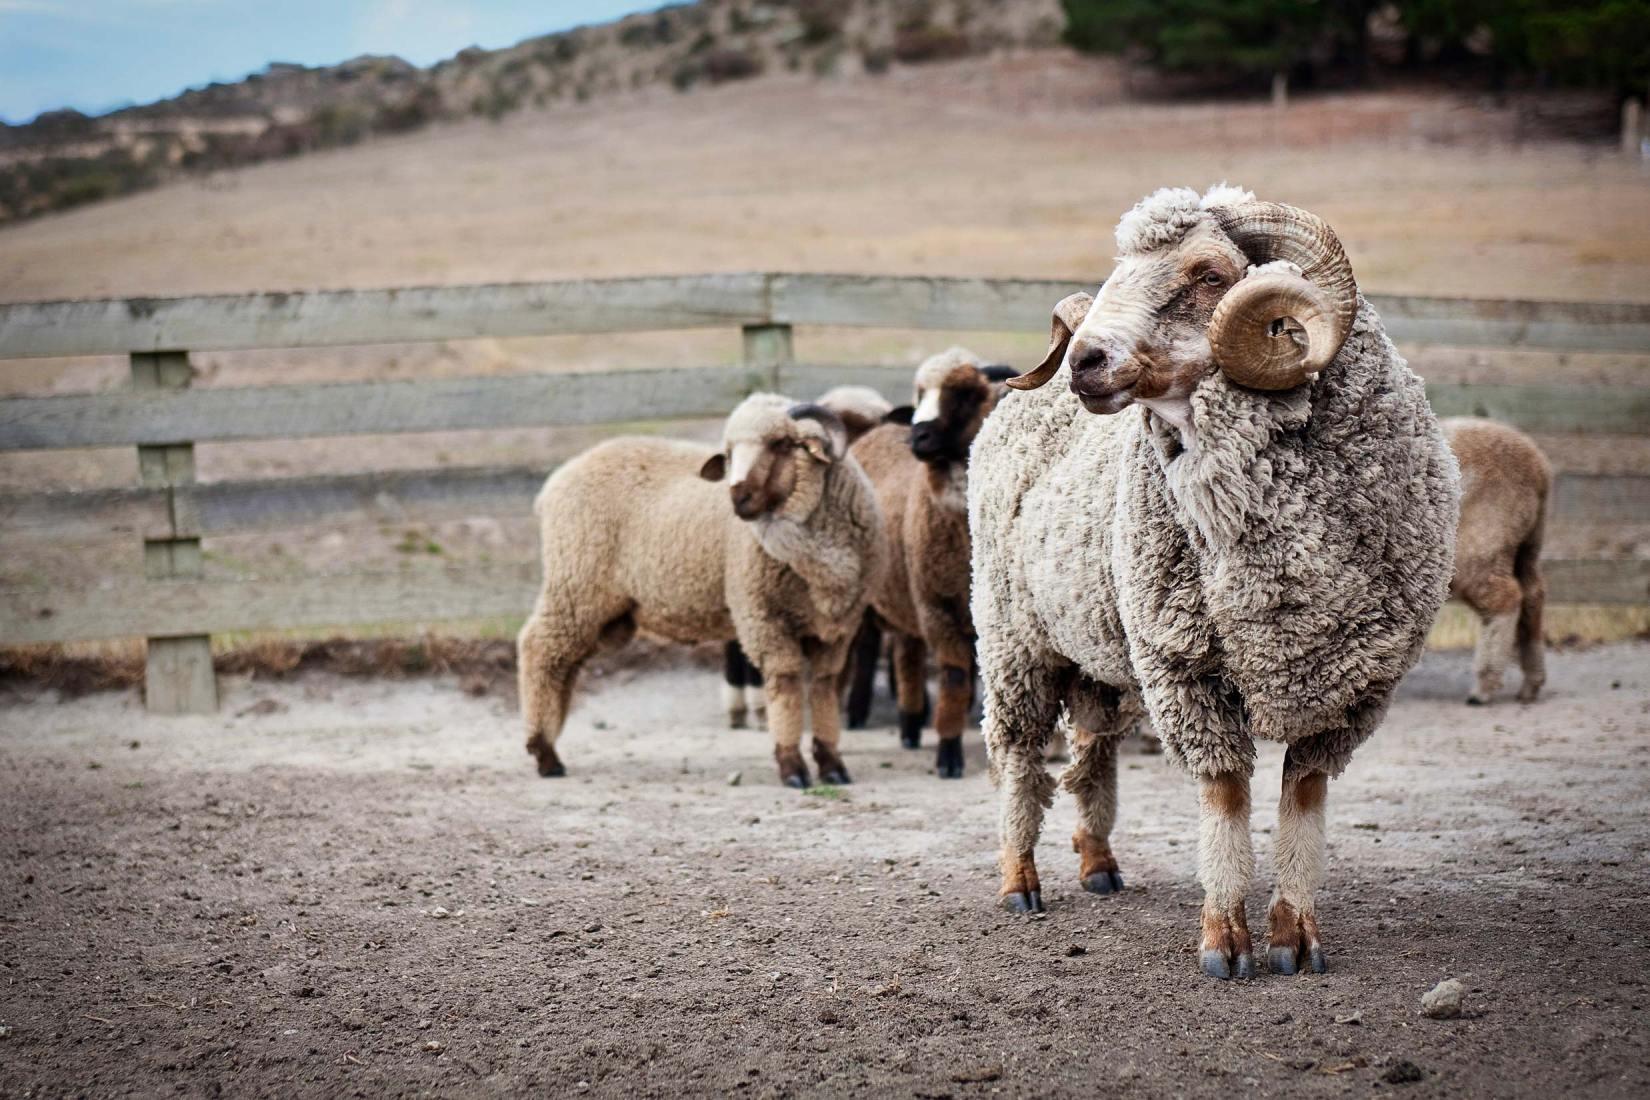 10014-1147-Image-Workshop-Melbourne-photographer-New-Zealand-merino-sheep-farm-wool-ram